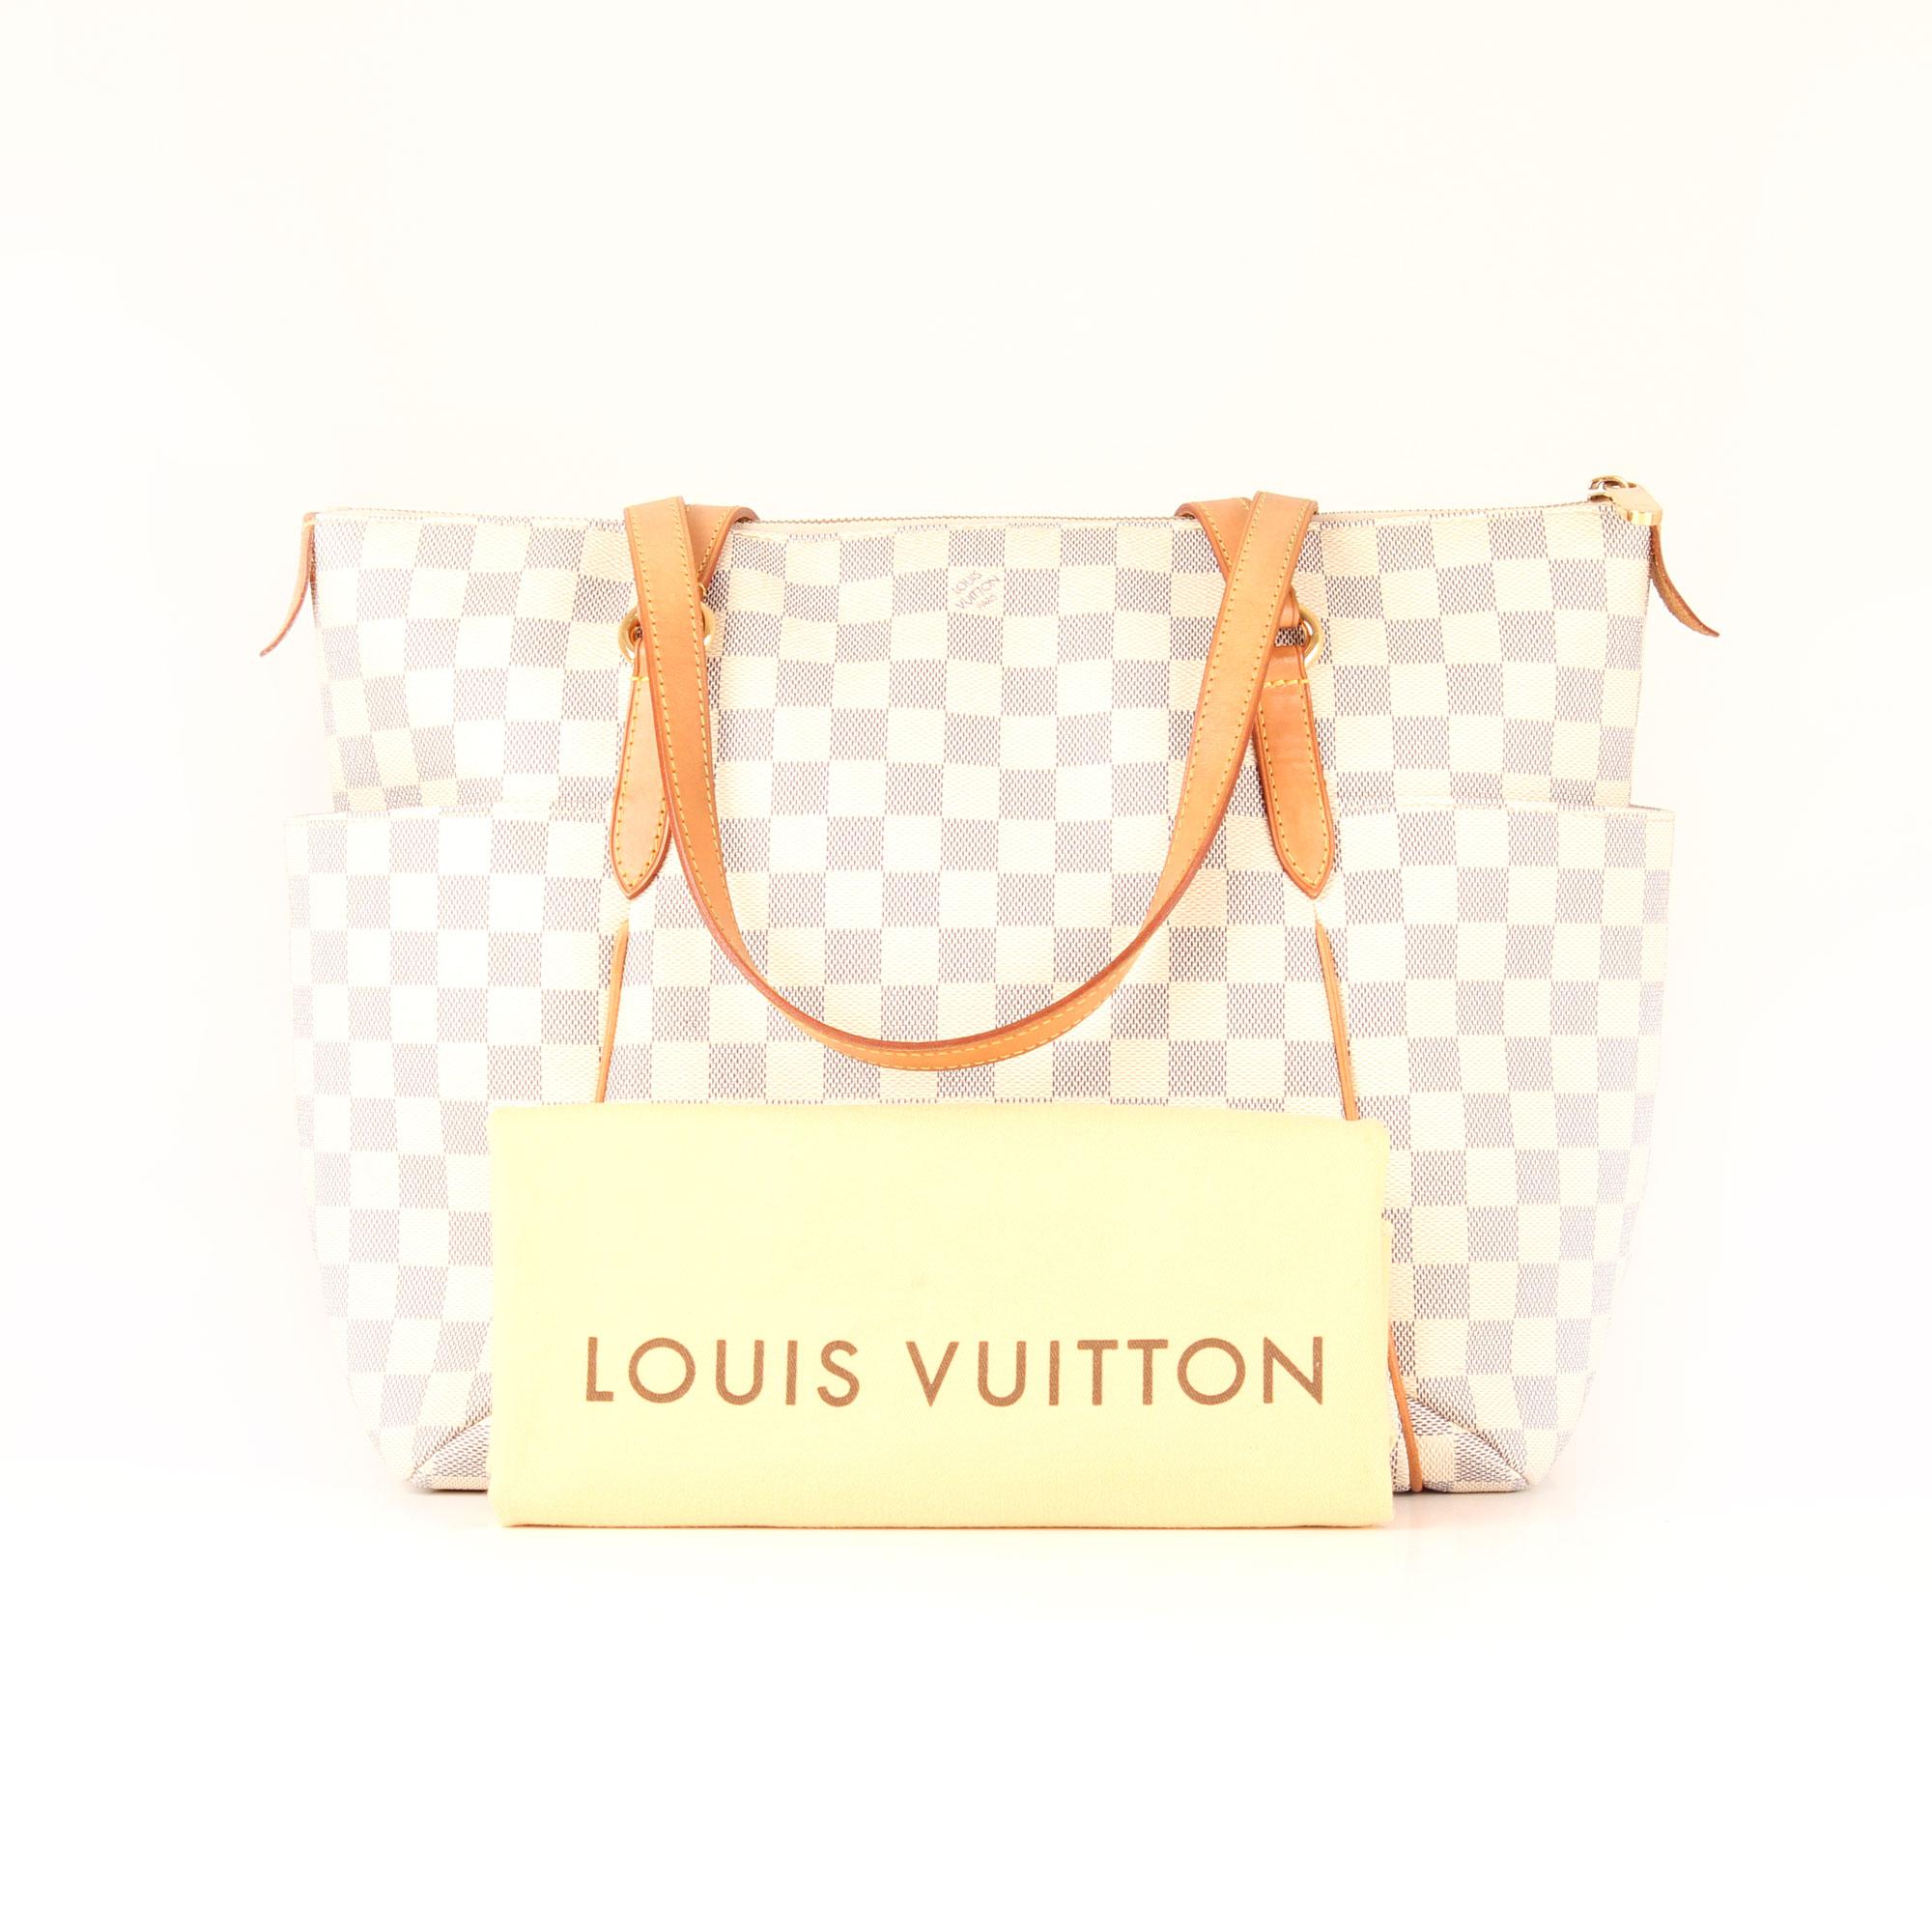 43880d555 Louis Vuitton Totally MM Damier Azur | CBL Bags